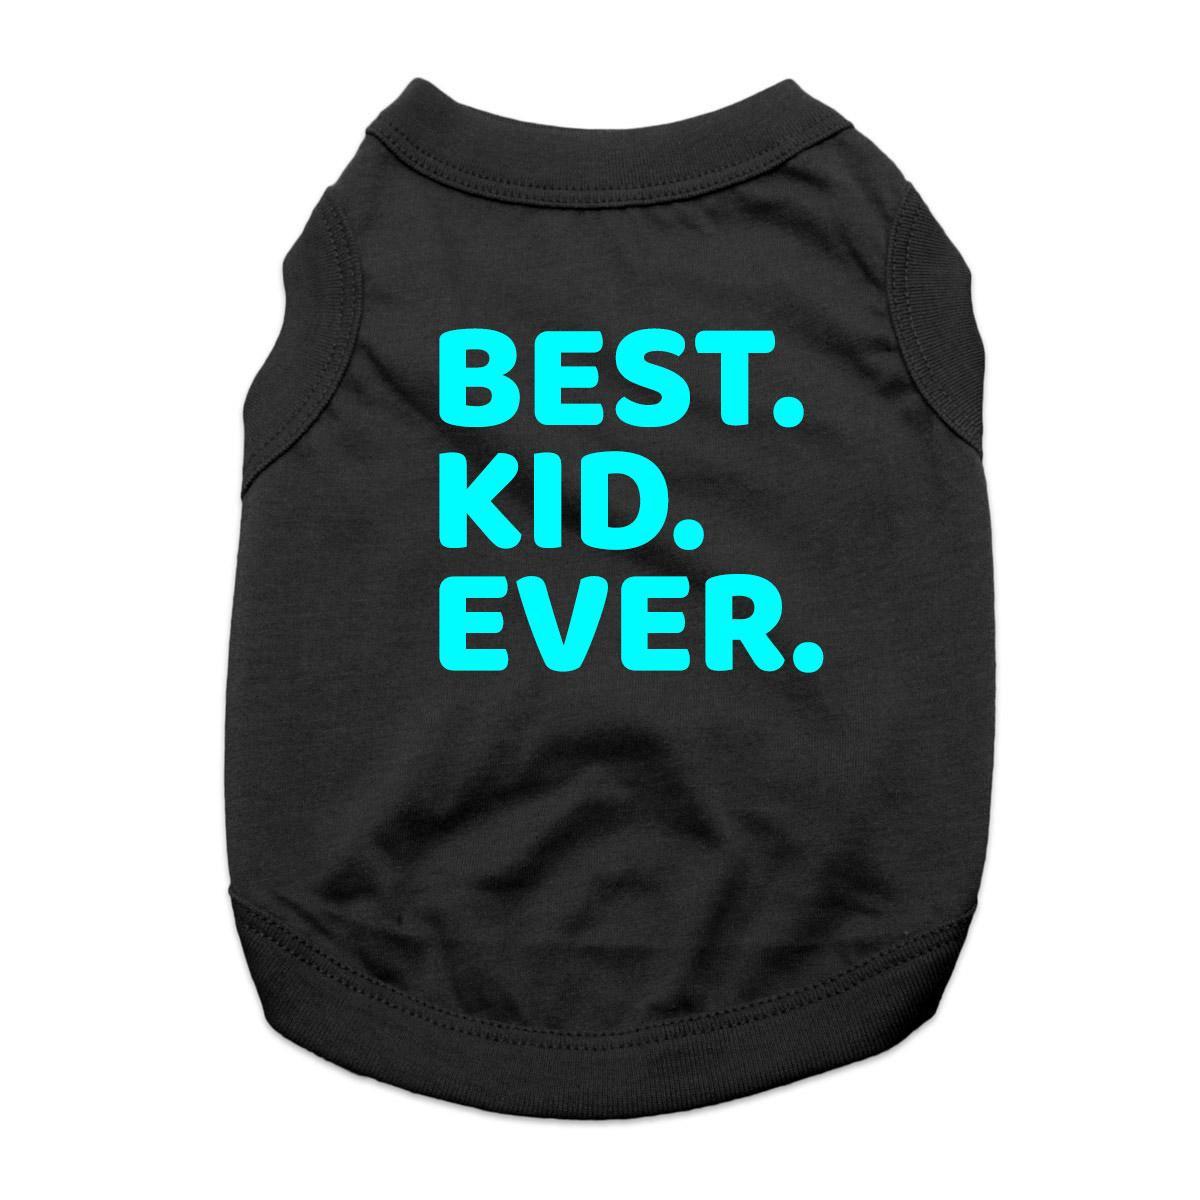 Best. Kid. Ever. Dog Shirt - Black